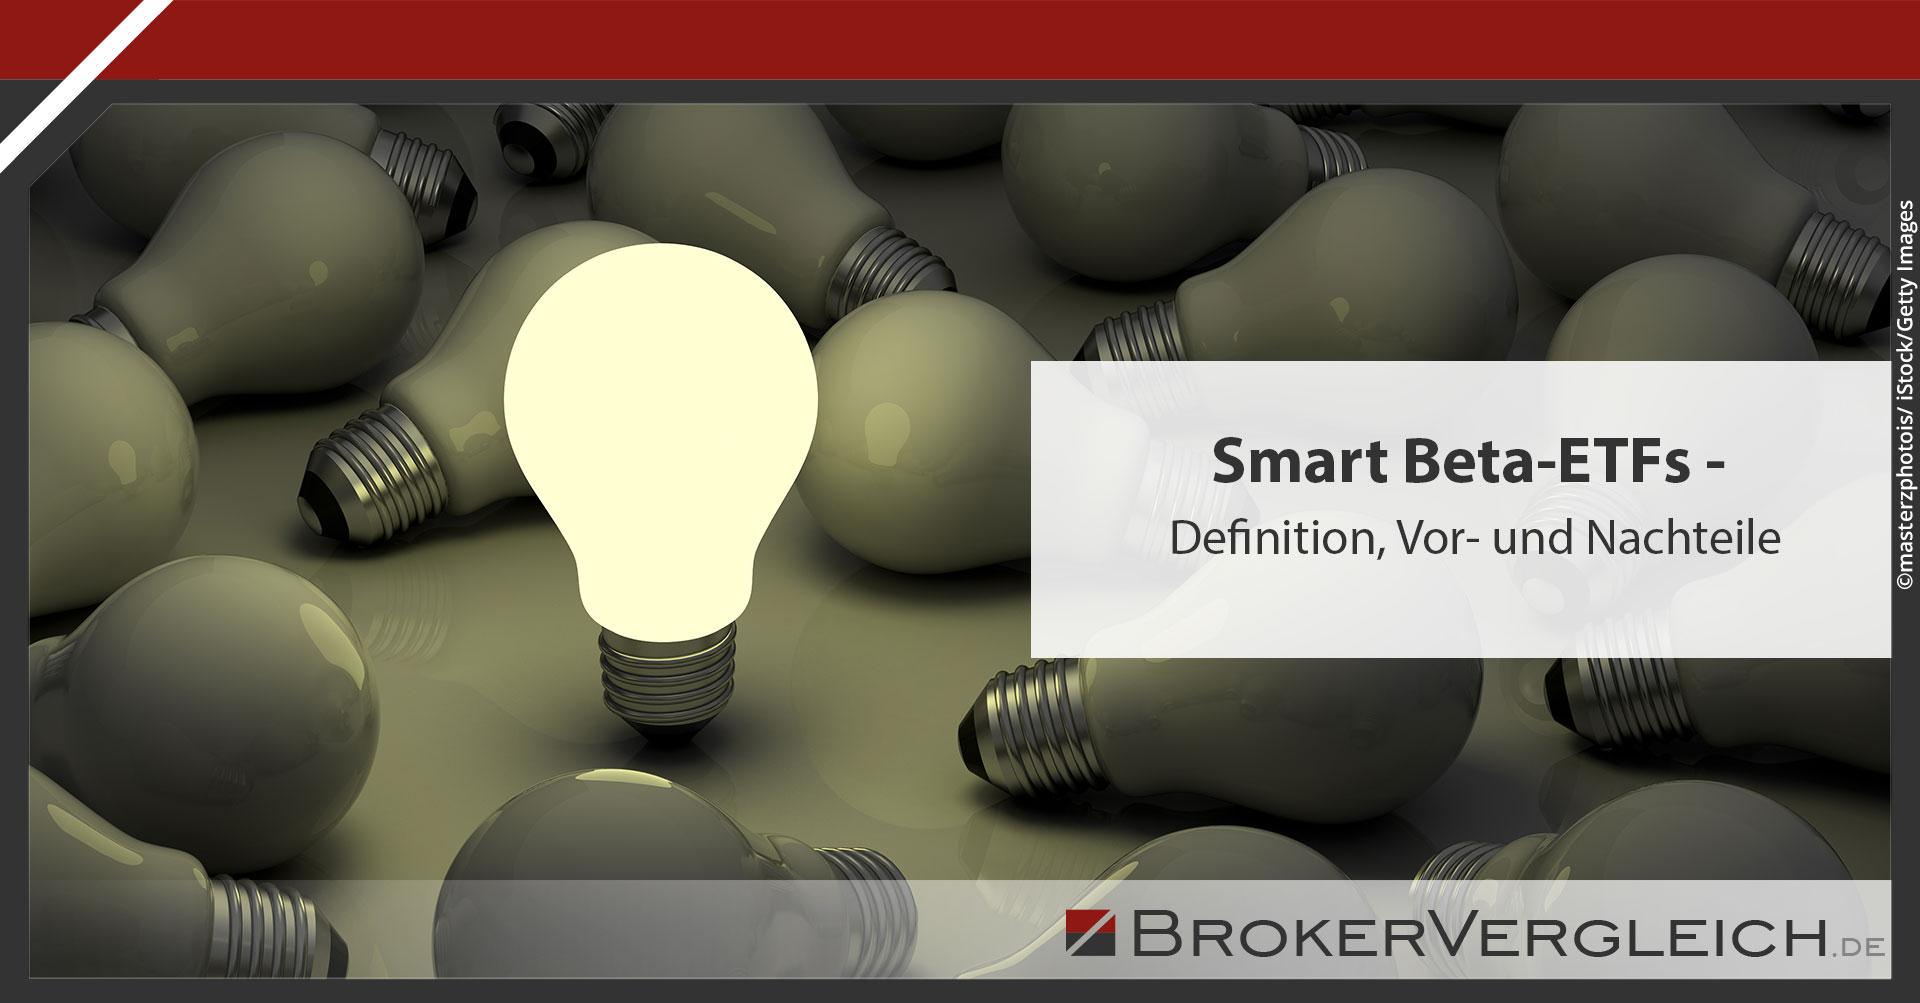 Zum Beitrag - Smart Beta-ETFs